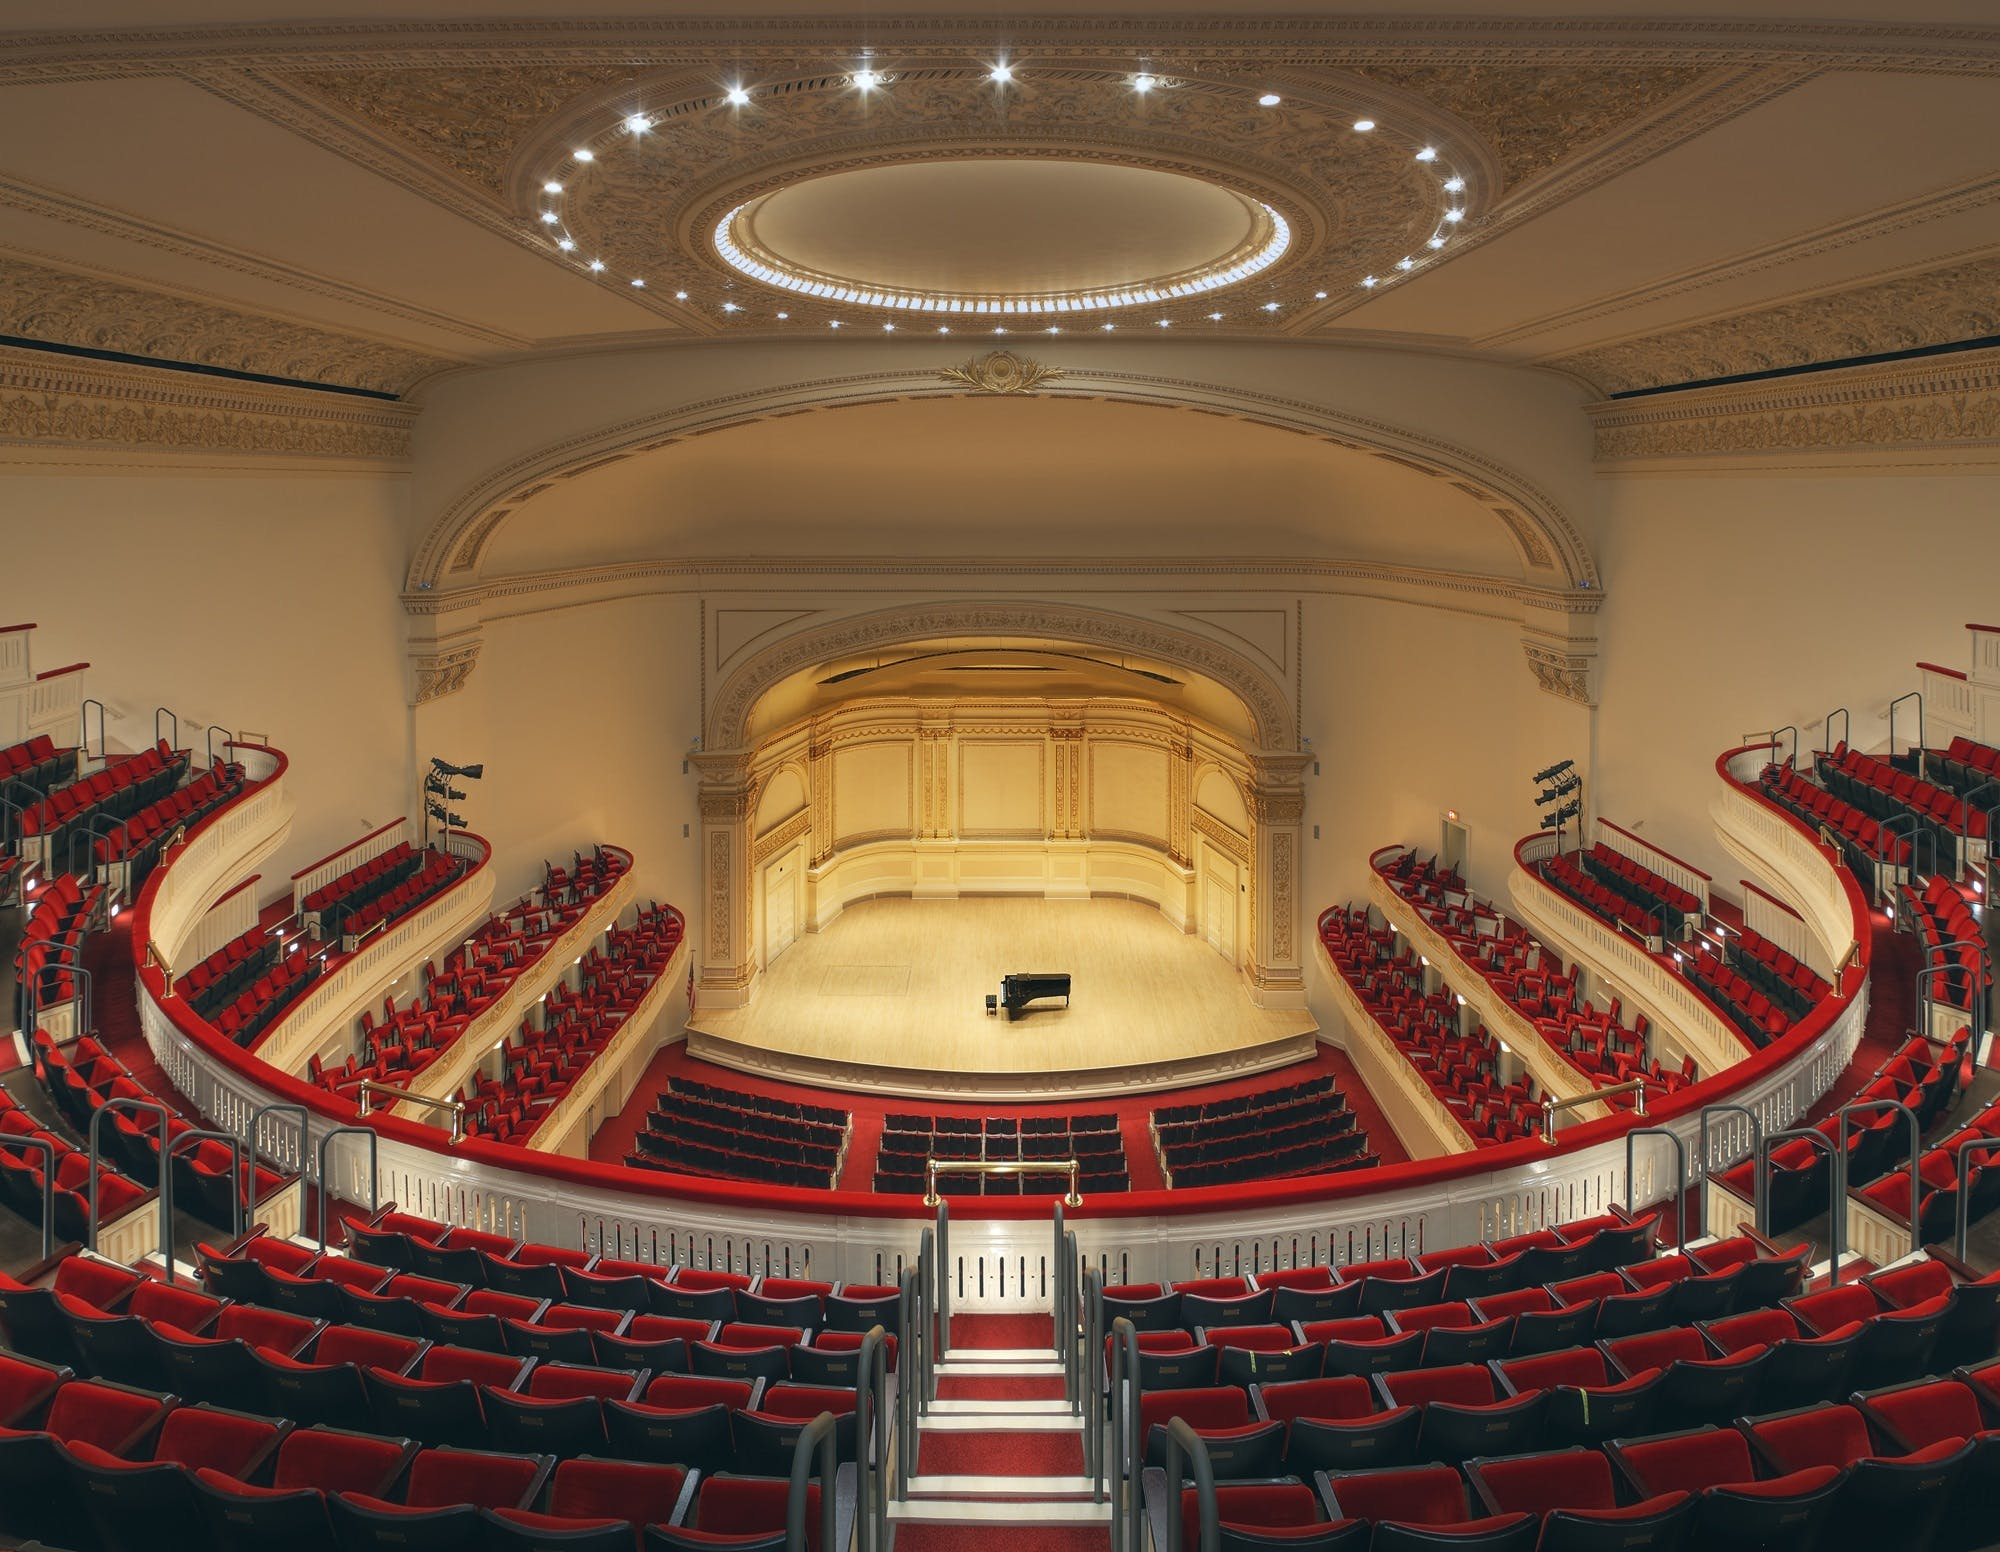 Isaac stern auditorium ronald o perelman stage carnegie hall